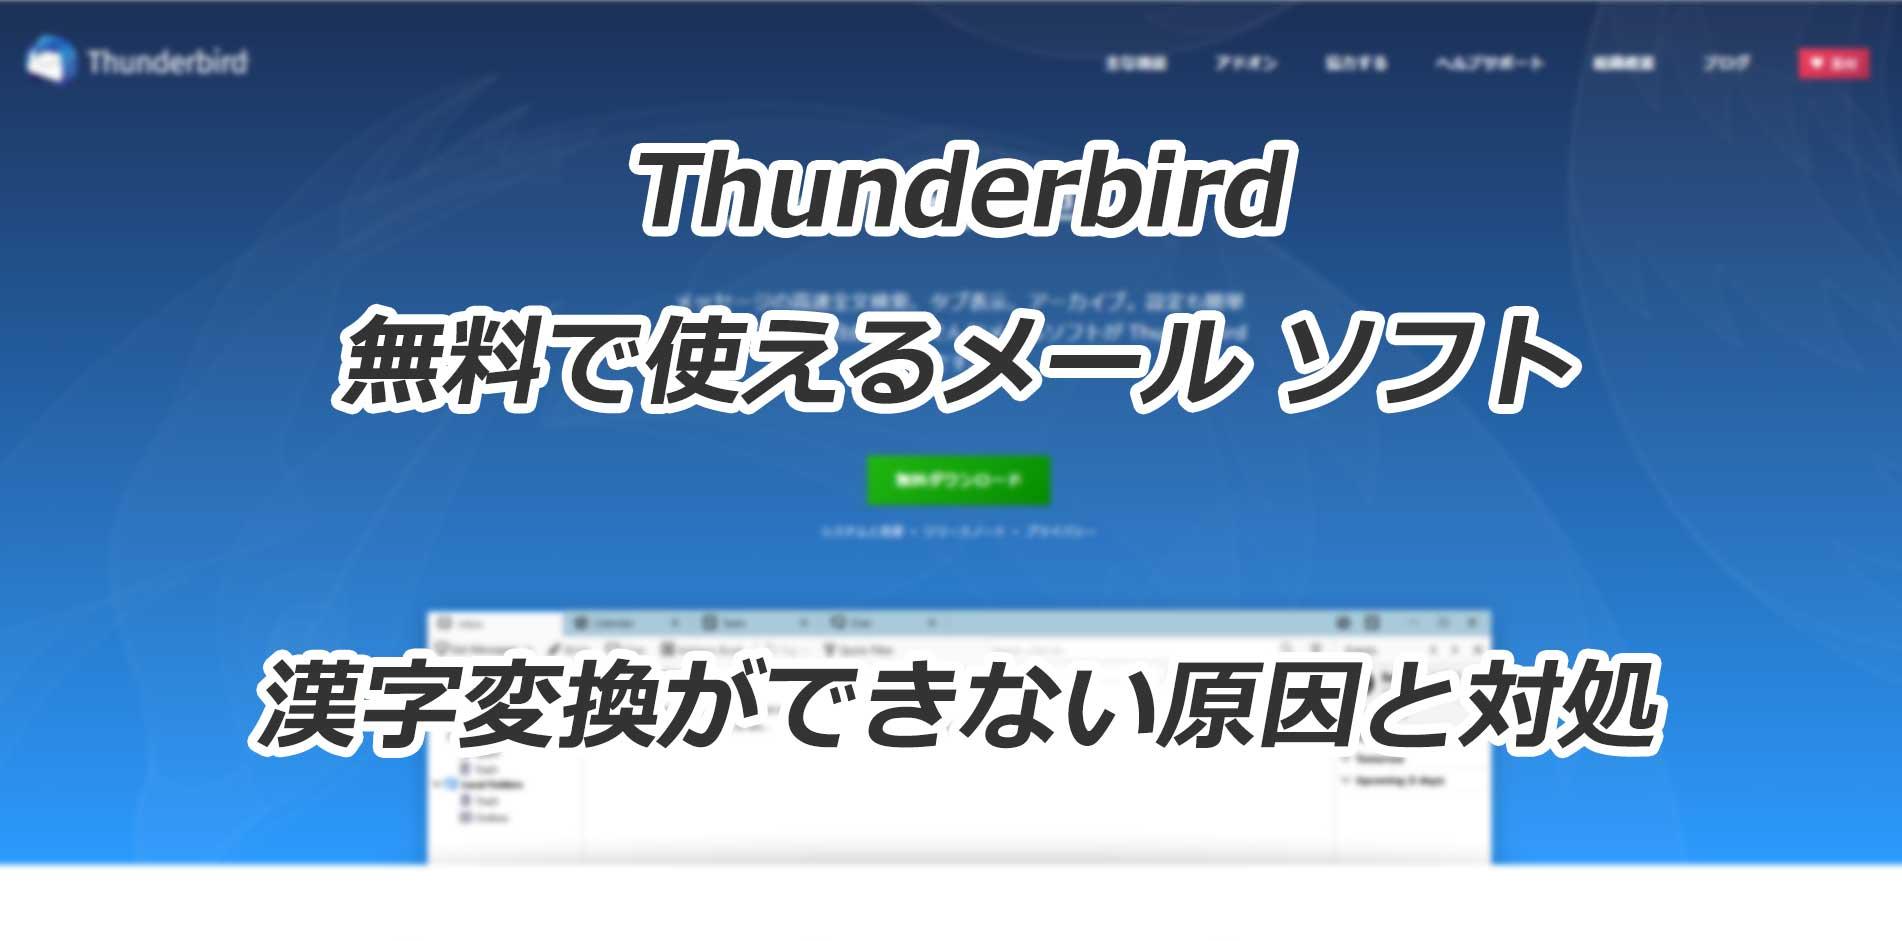 Thunderbirdメーラーで日本語変換ができない原因と対処